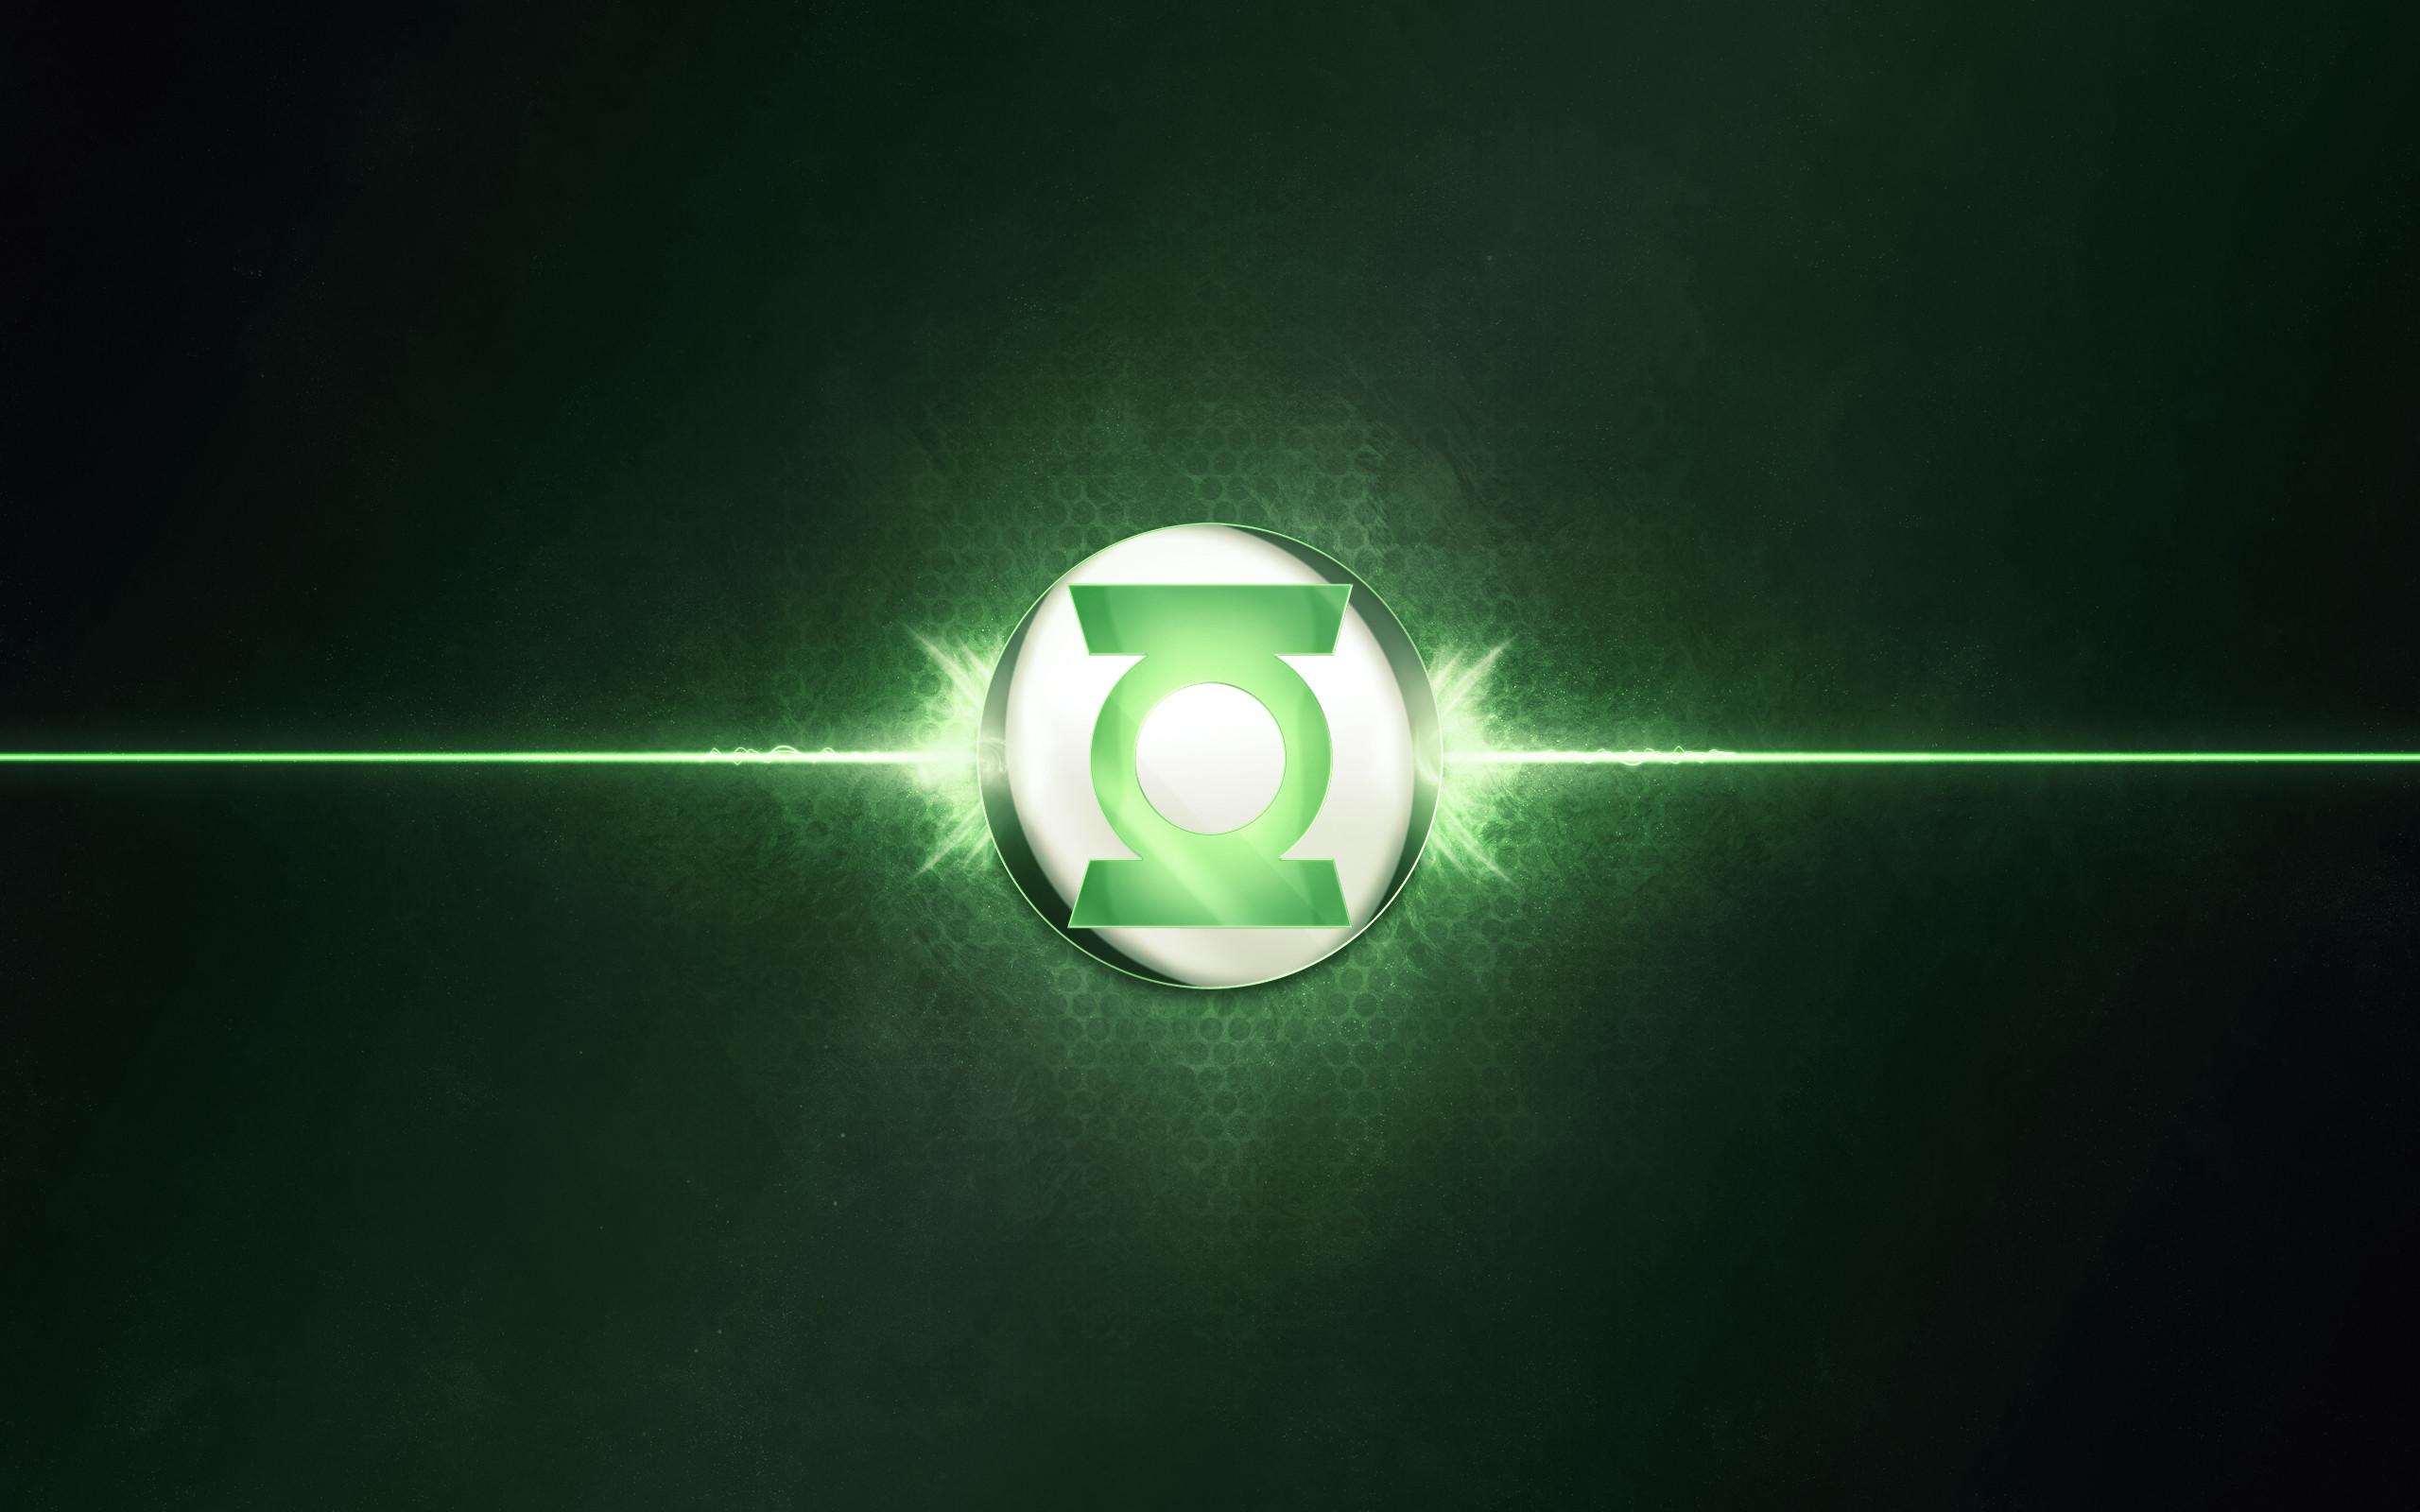 Lego Green Lantern Wallpaper Movies wallpaper set 7